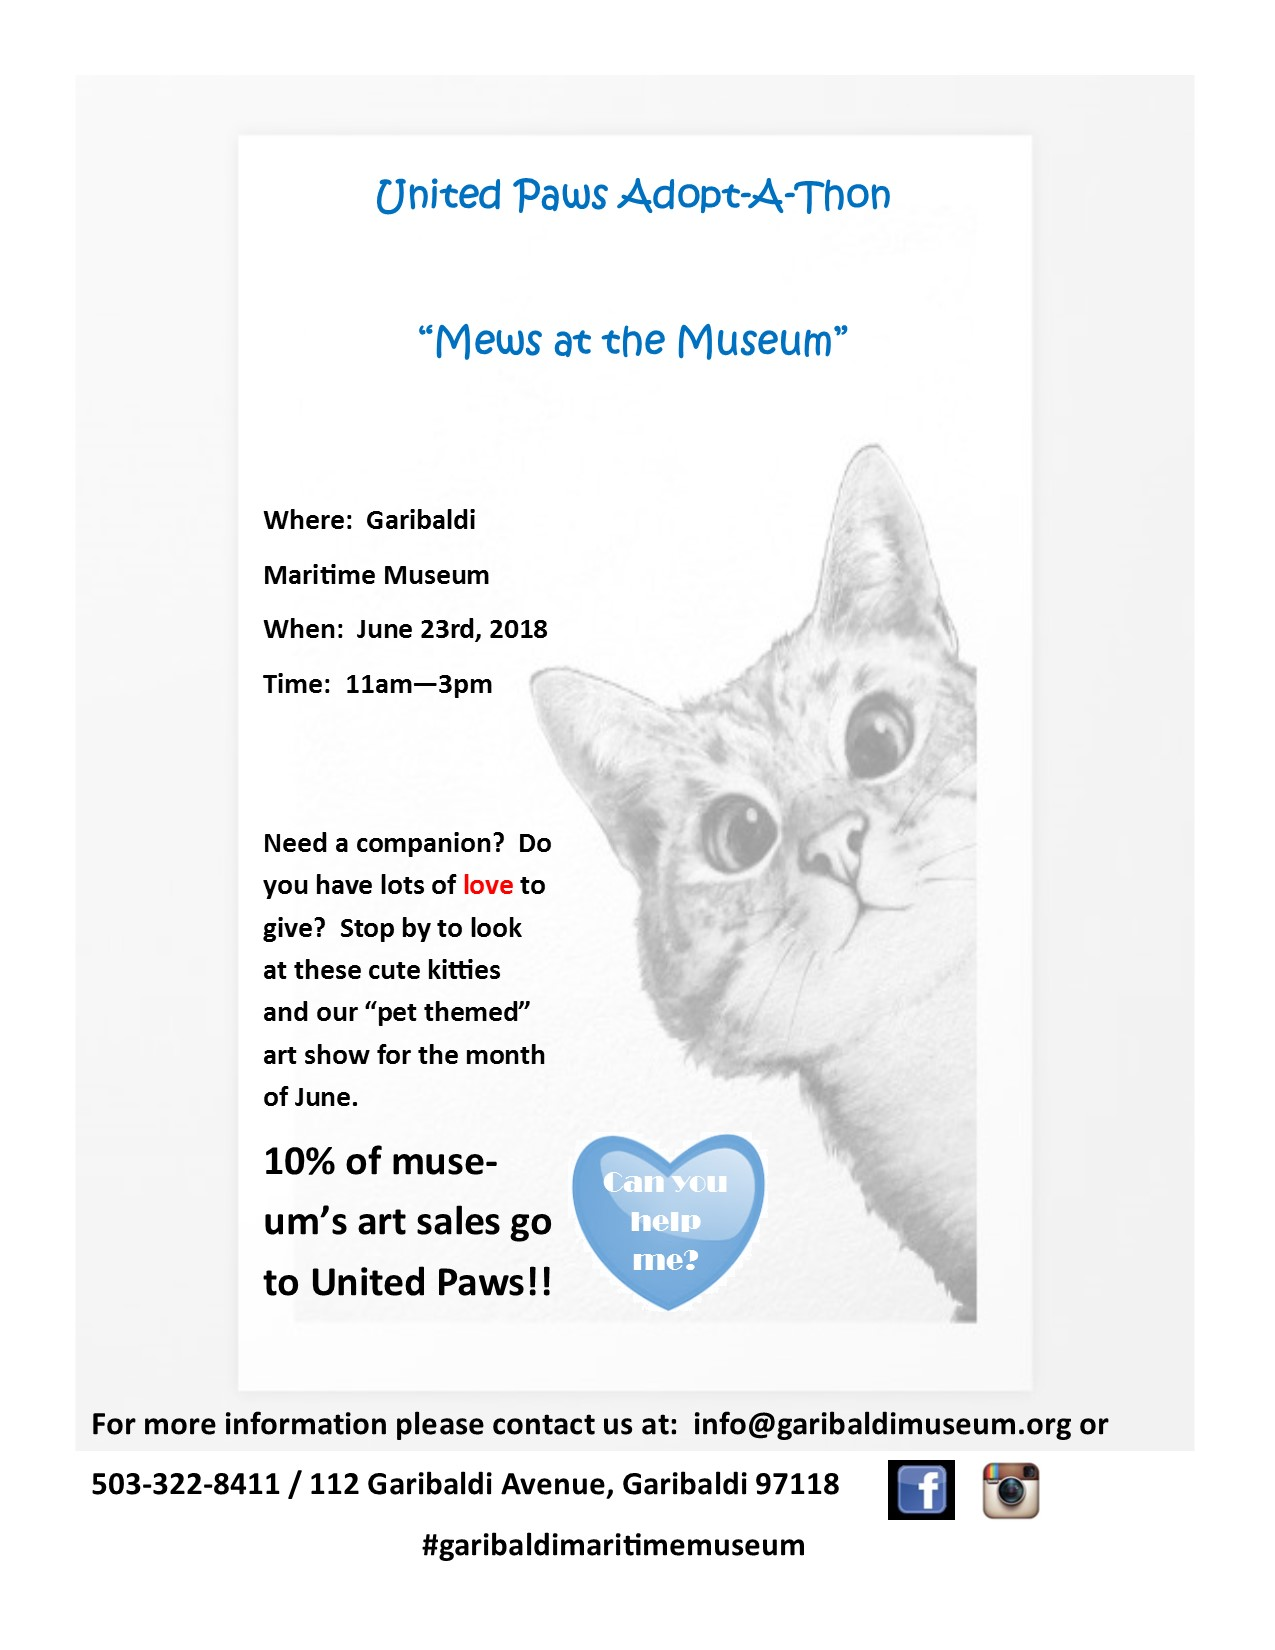 adopt a thon poster 1